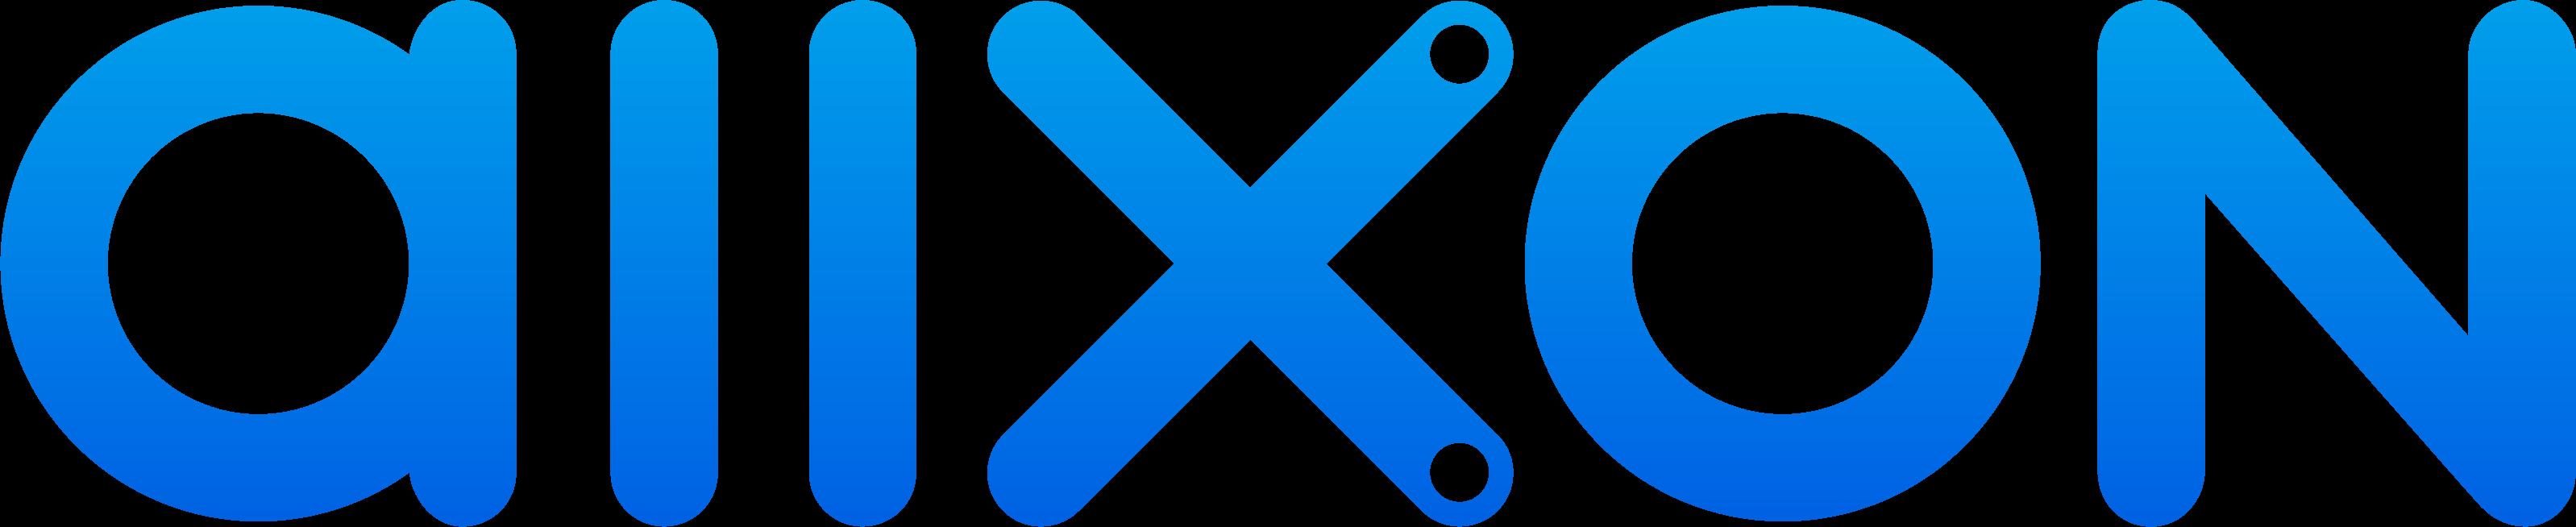 Allxon_Logo_Gradient-01